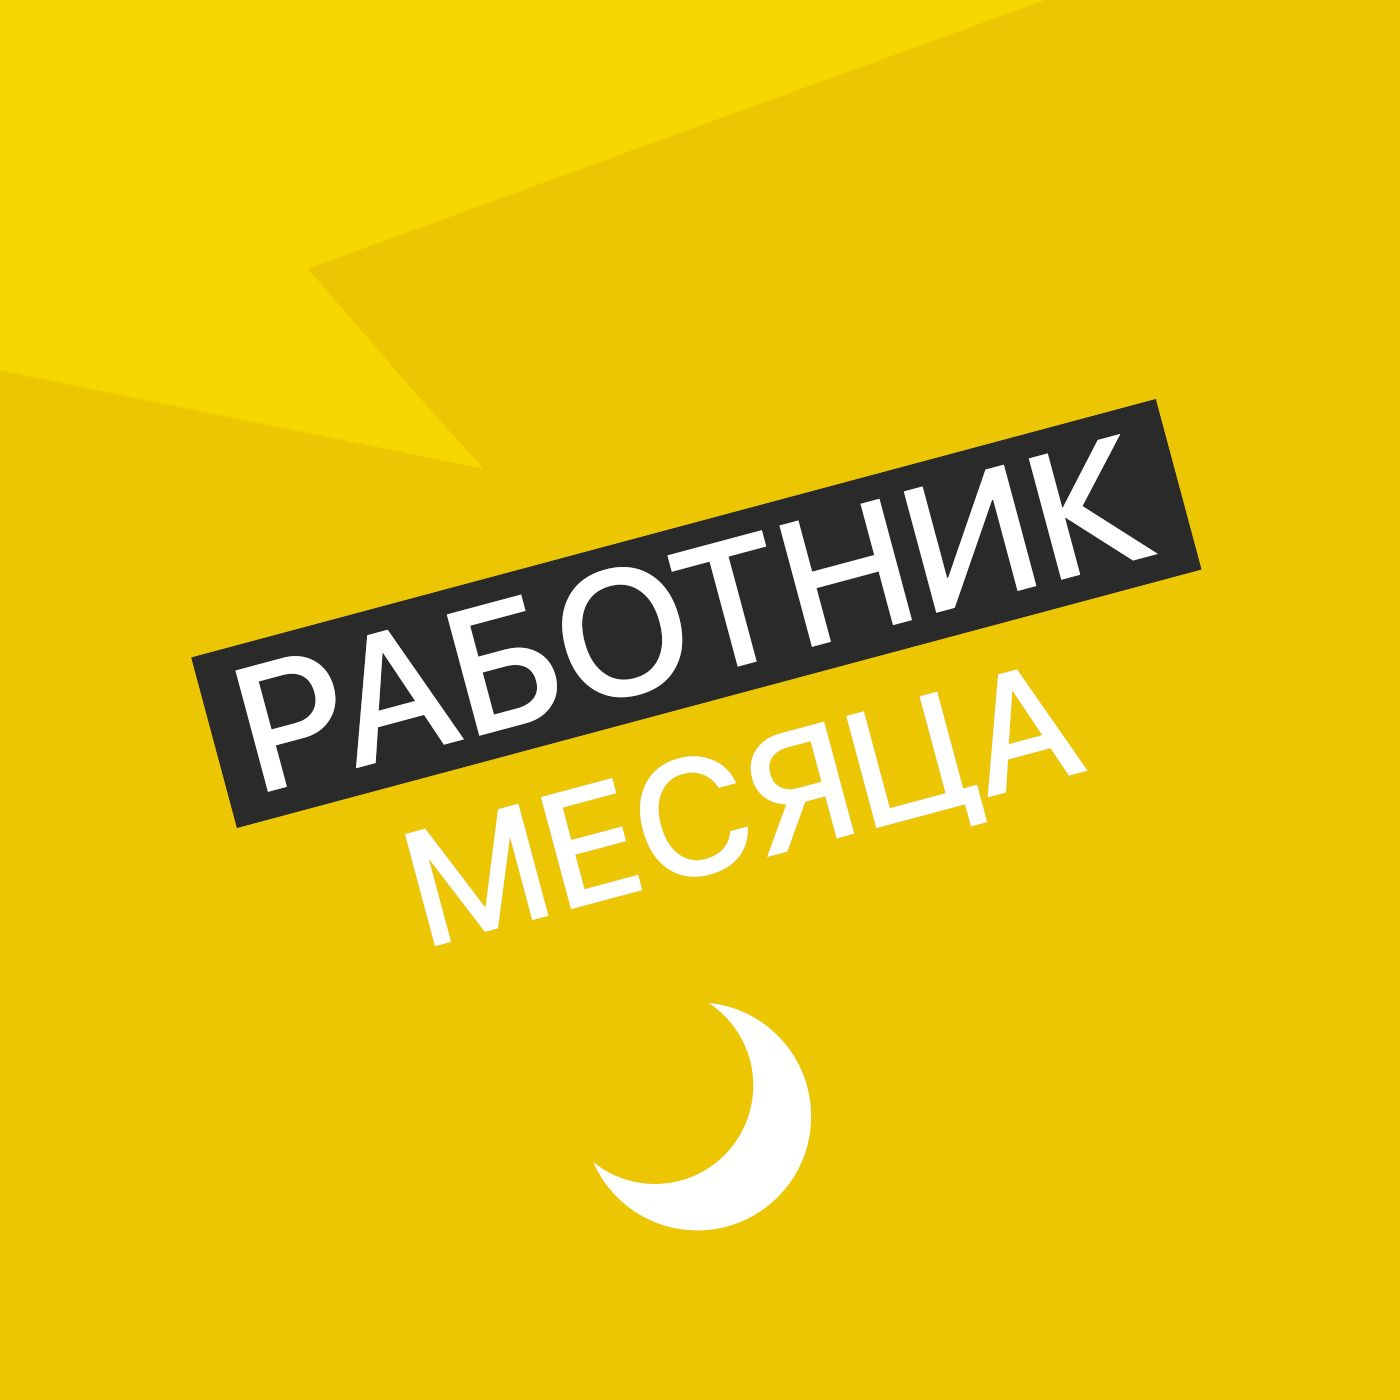 Музыкант_Творческий коллектив Mojomedia